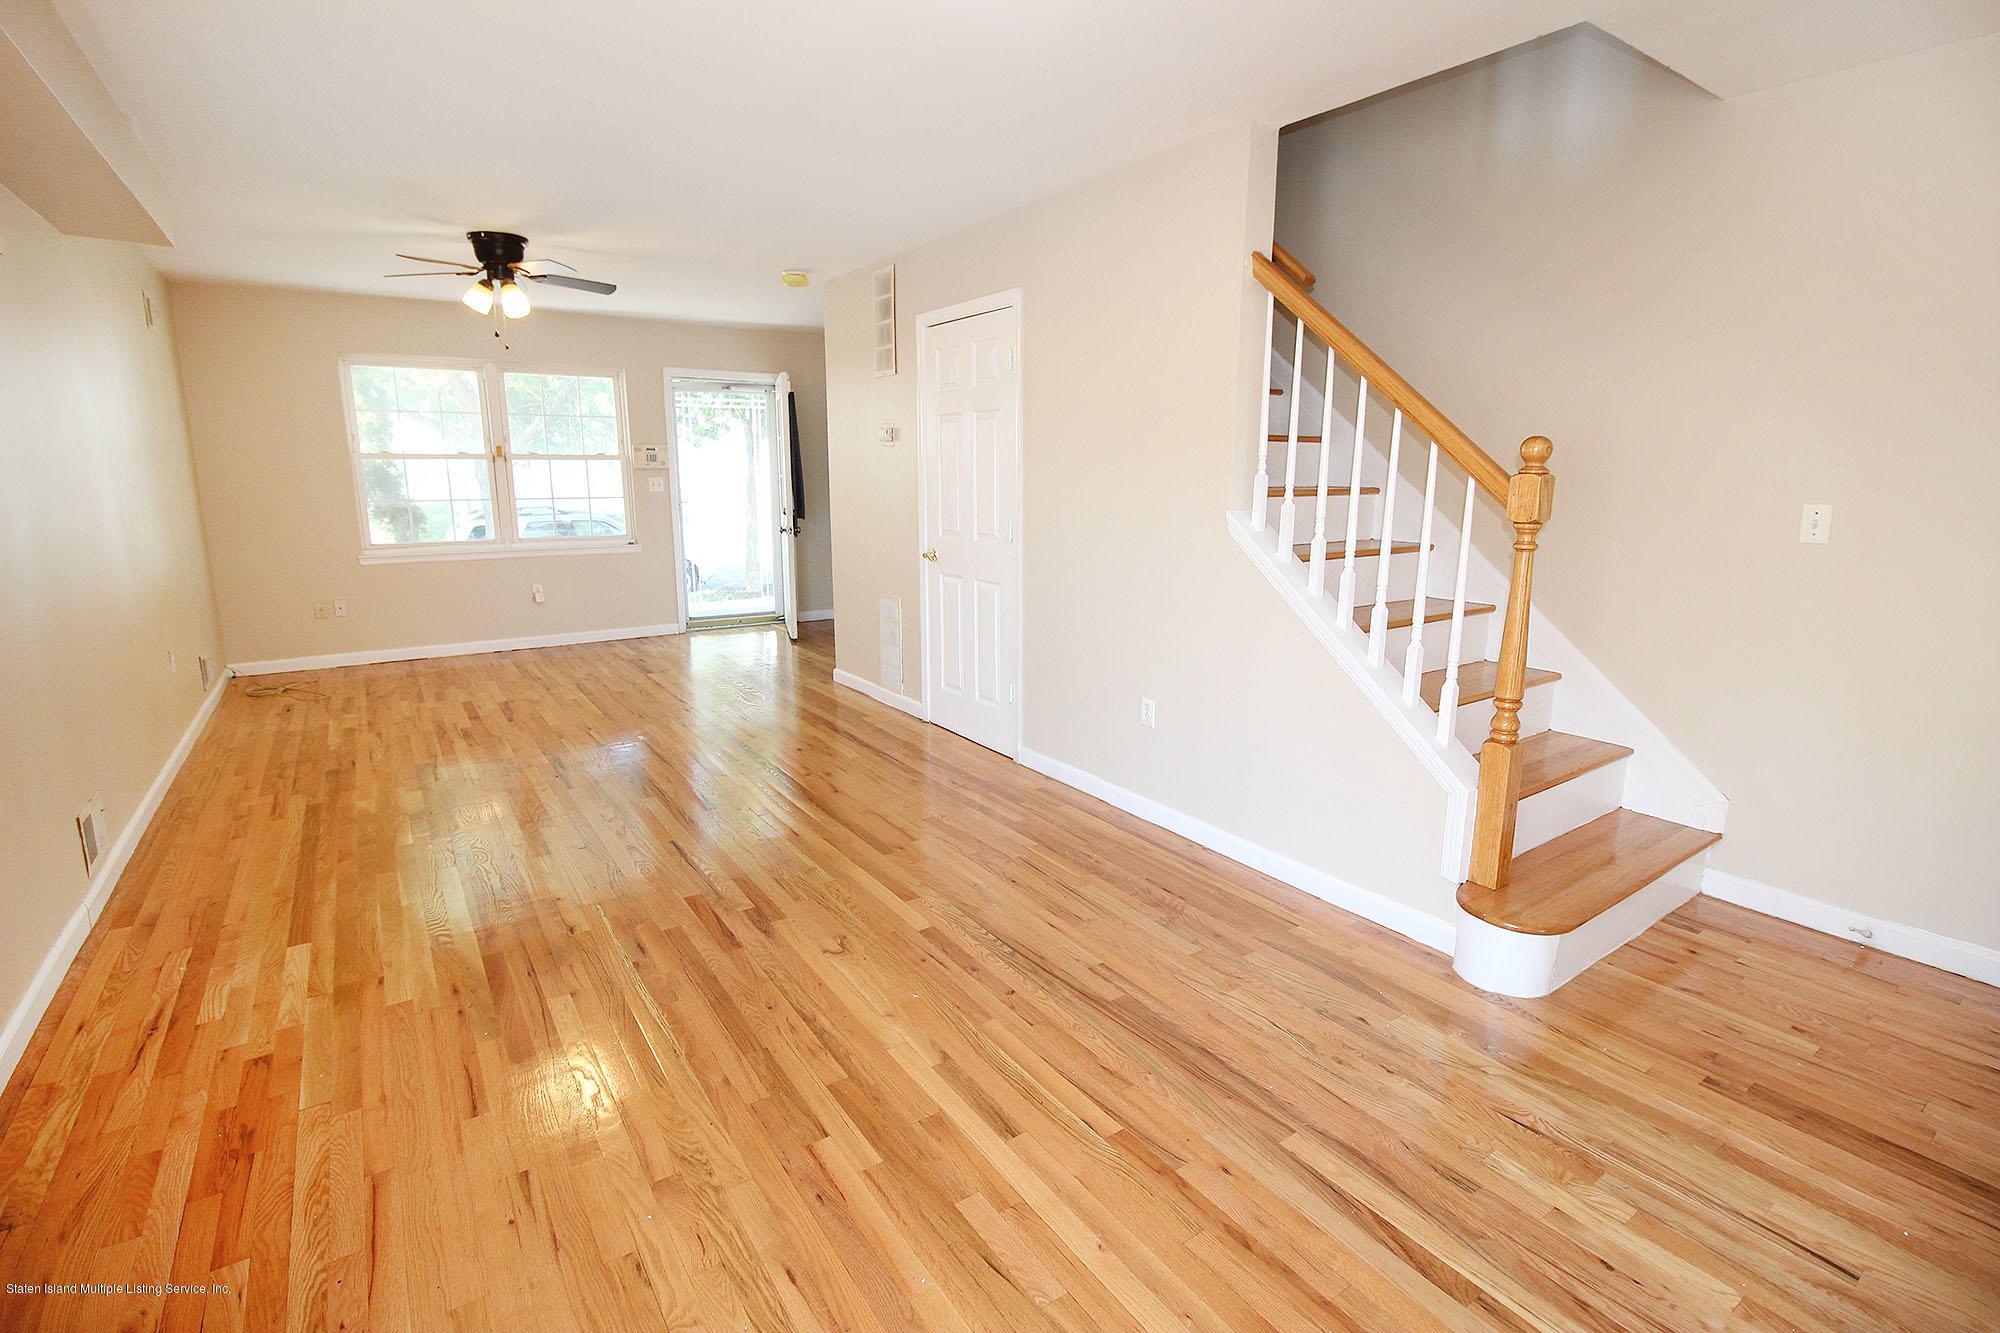 Single Family - Semi-Attached 230 Holden Boulevard  Staten Island, NY 10314, MLS-1139241-3